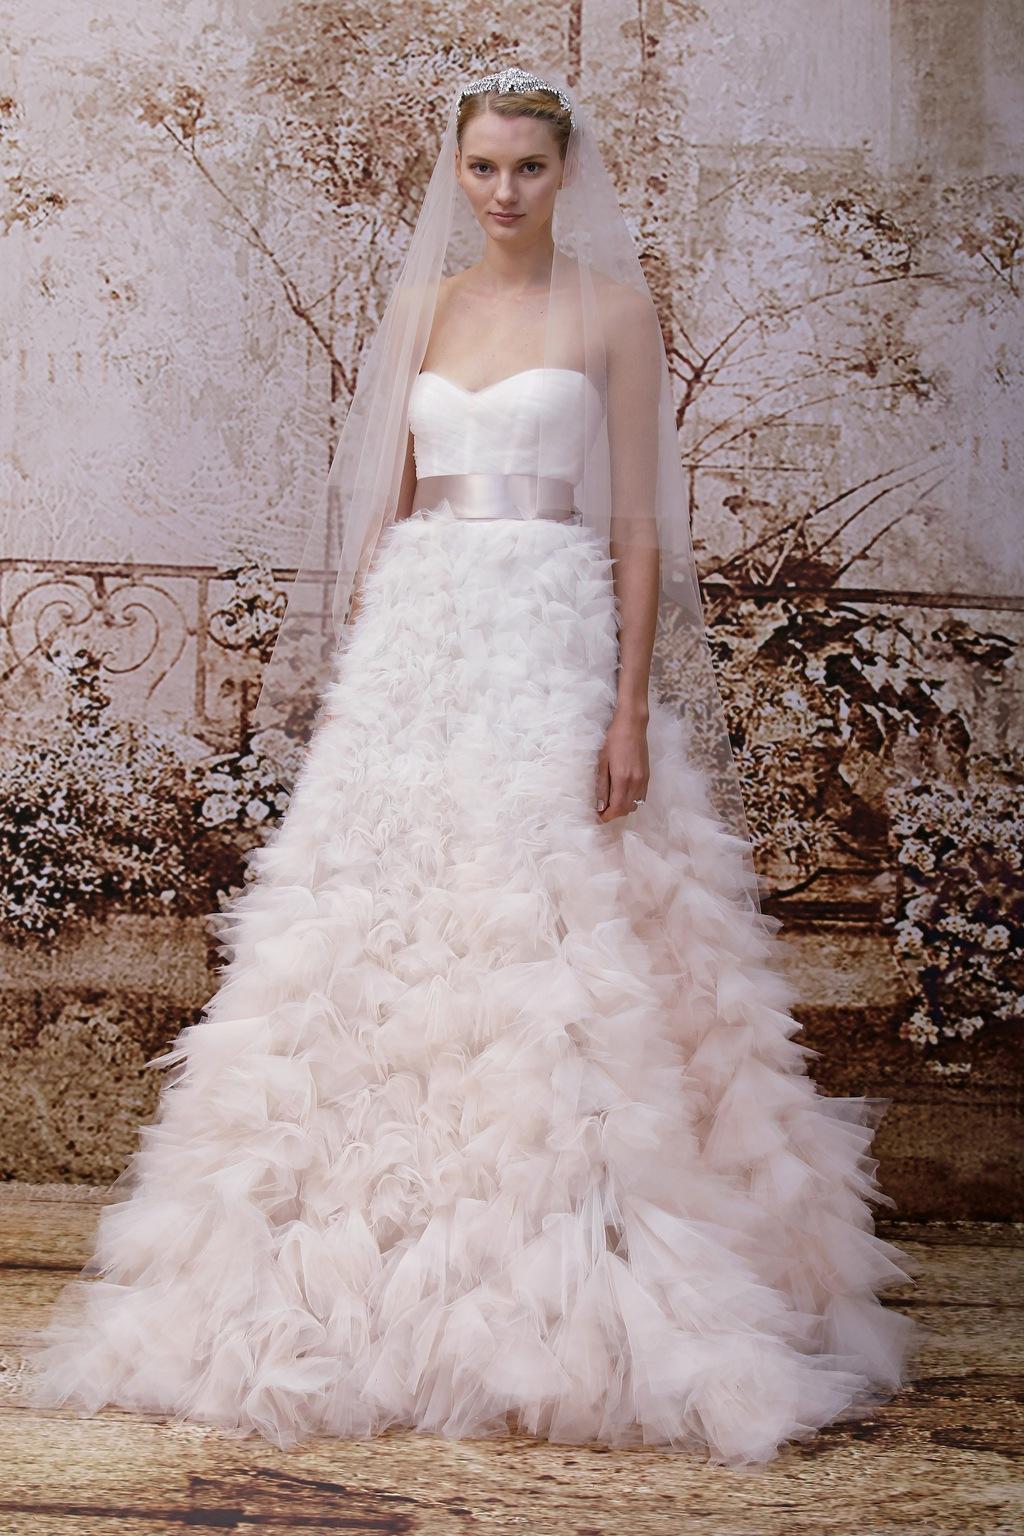 Wedding-dress-by-monique-lhuillier-fall-2014-bridal-look-35.full